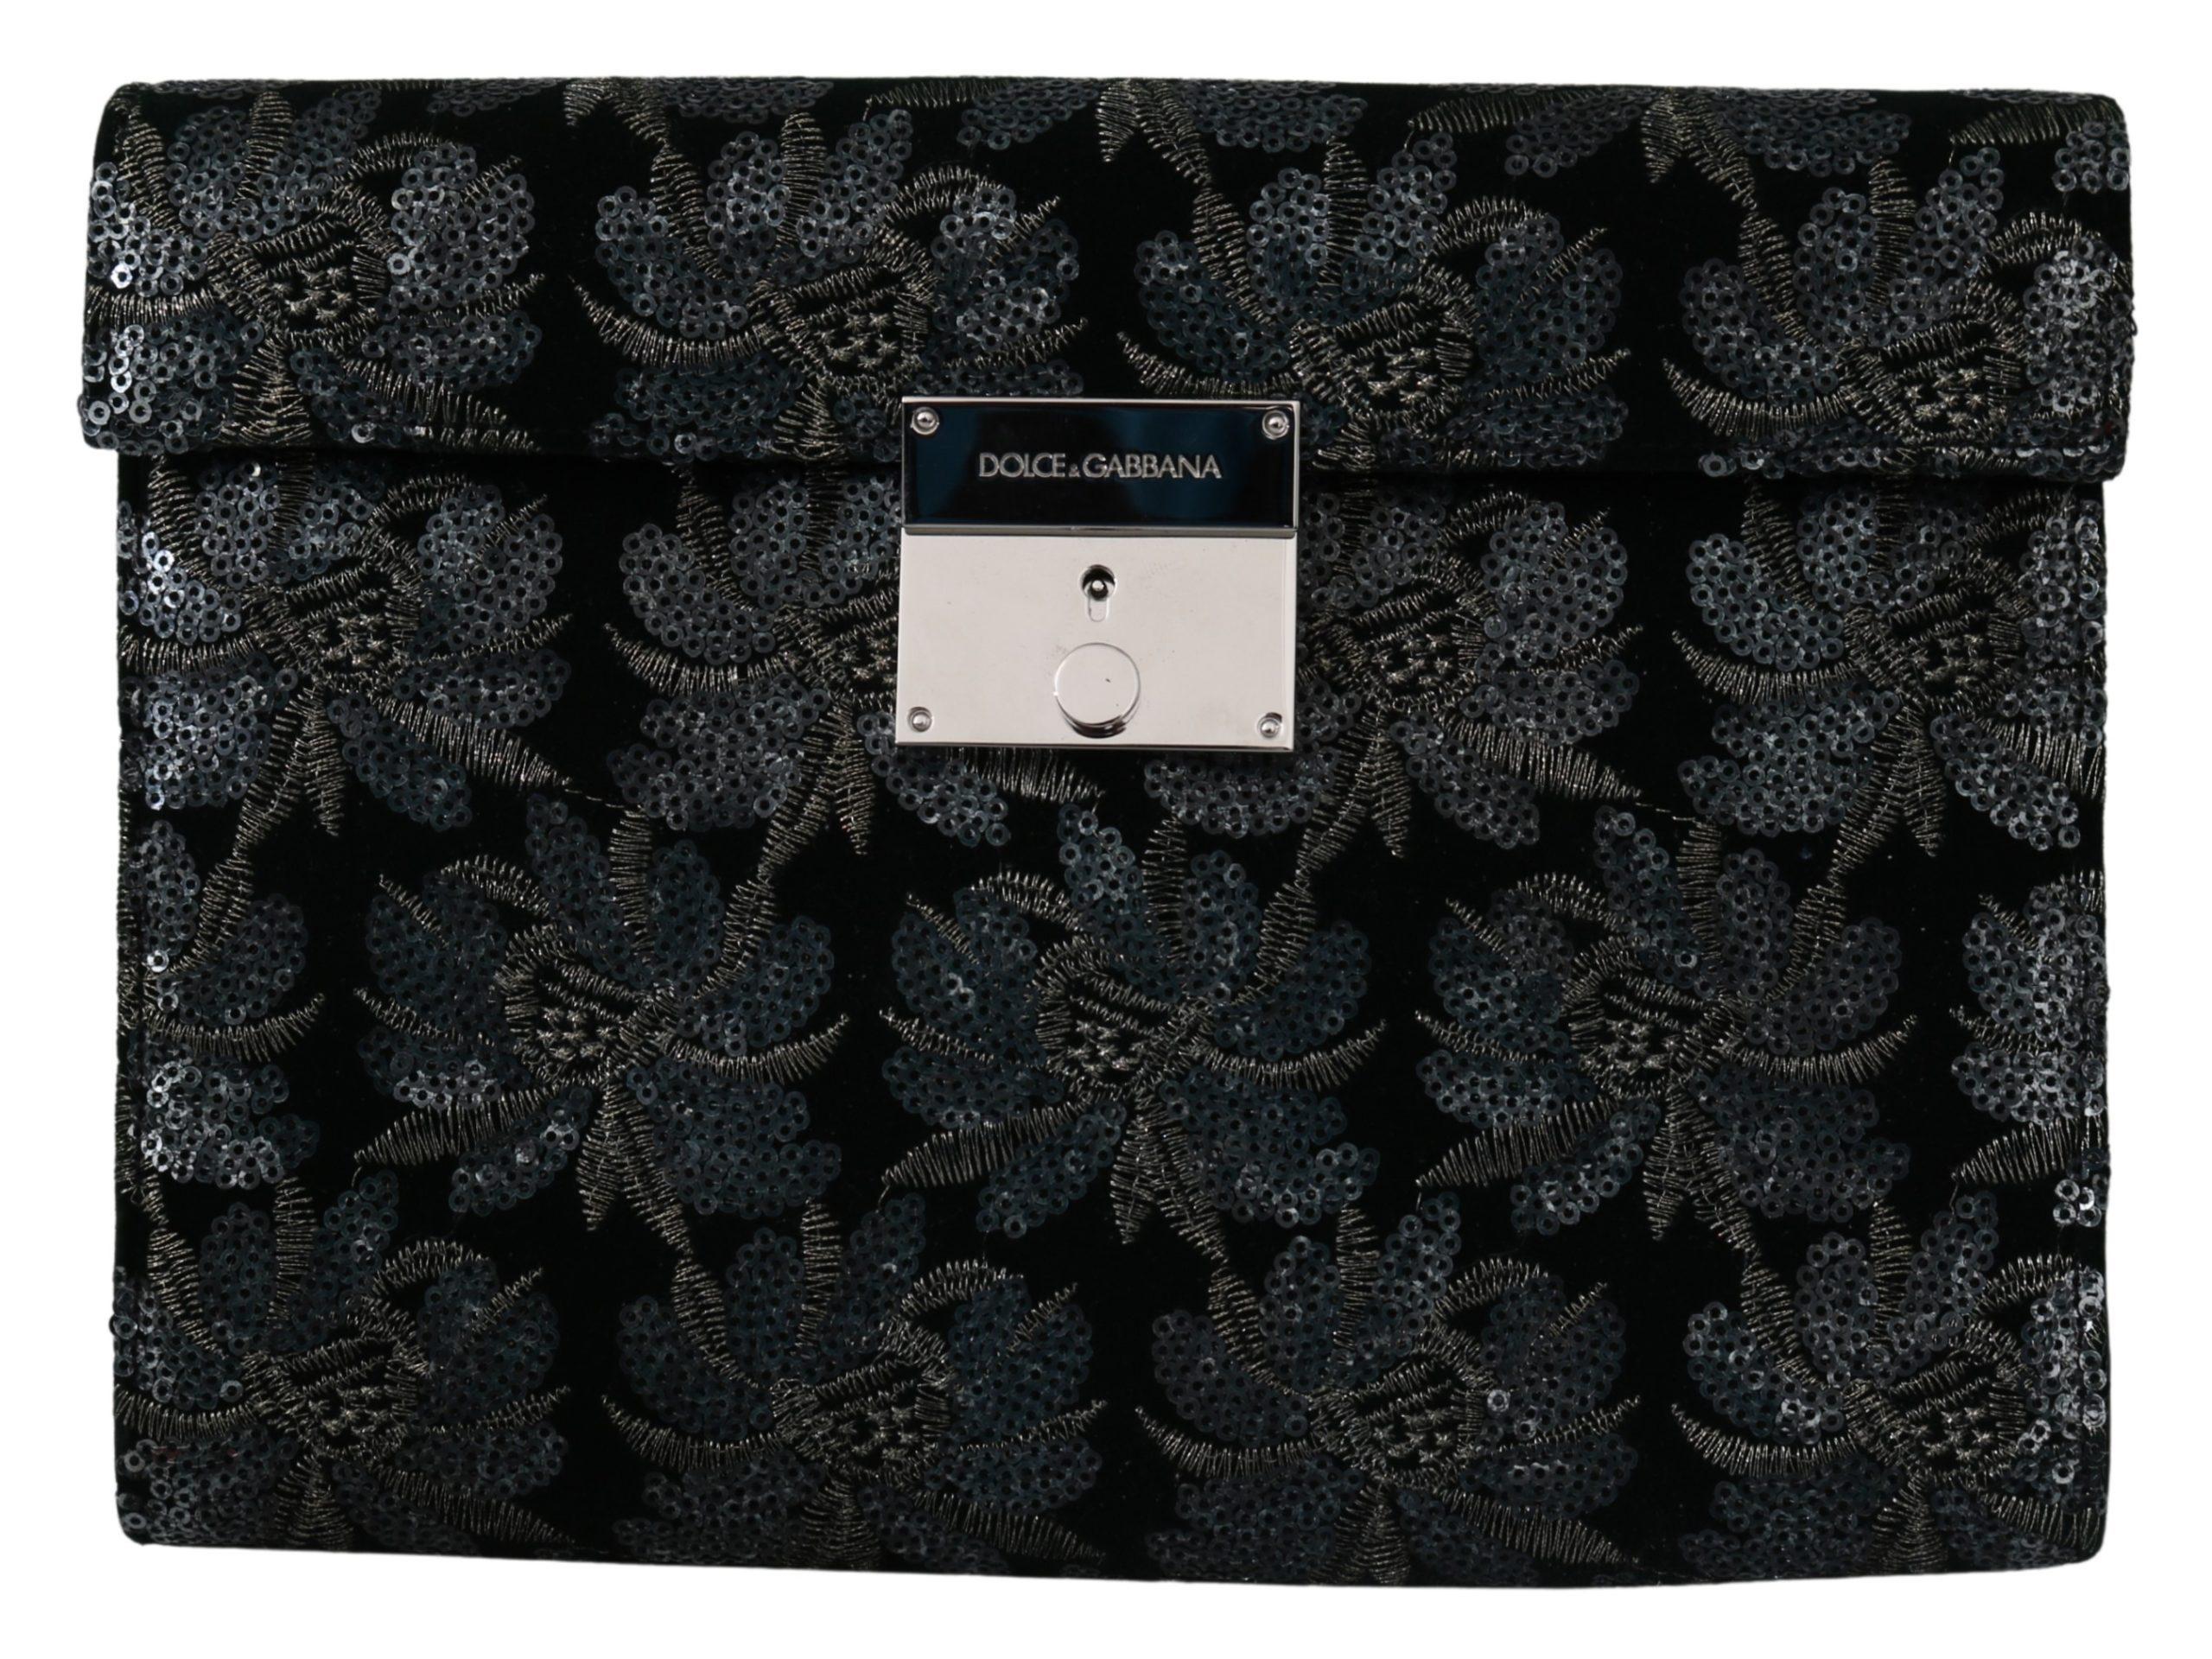 Dolce & Gabbana Men's Ricamo Sequined Leather Briefcase Bag Black VAS9861